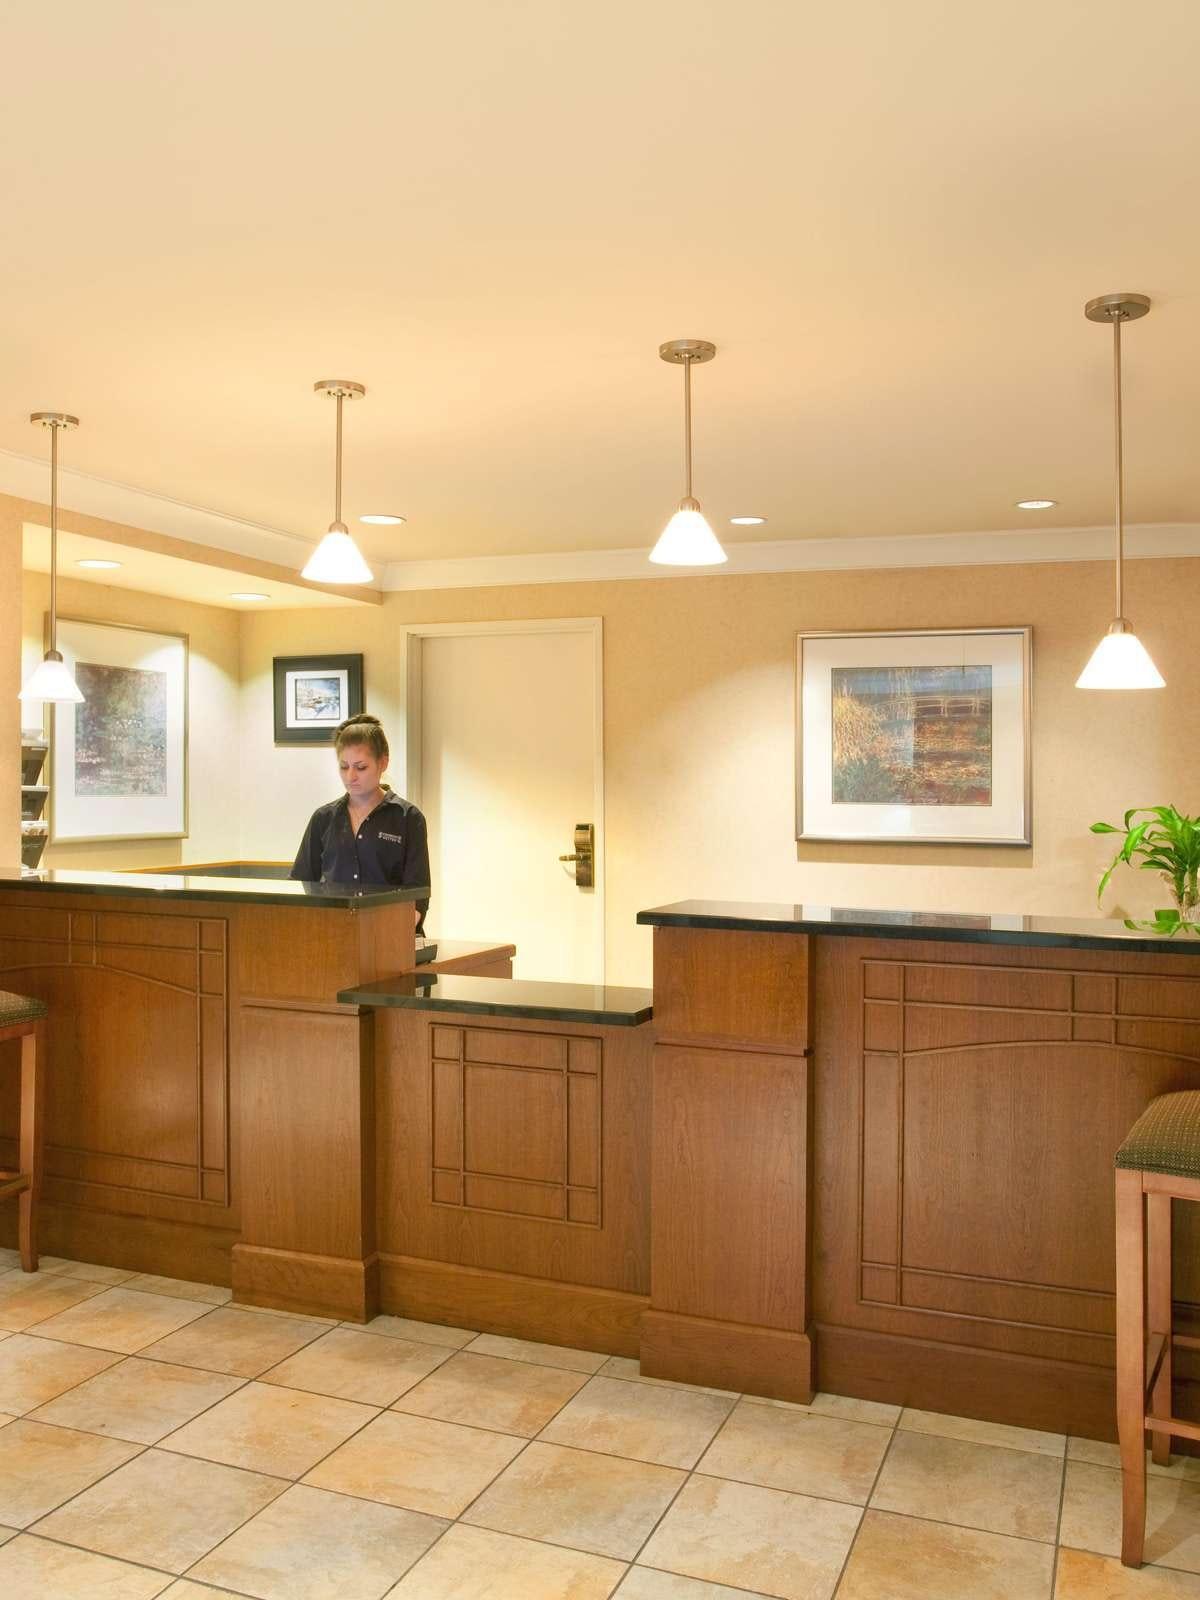 Staybridge Suites Chicago Lincolnshire